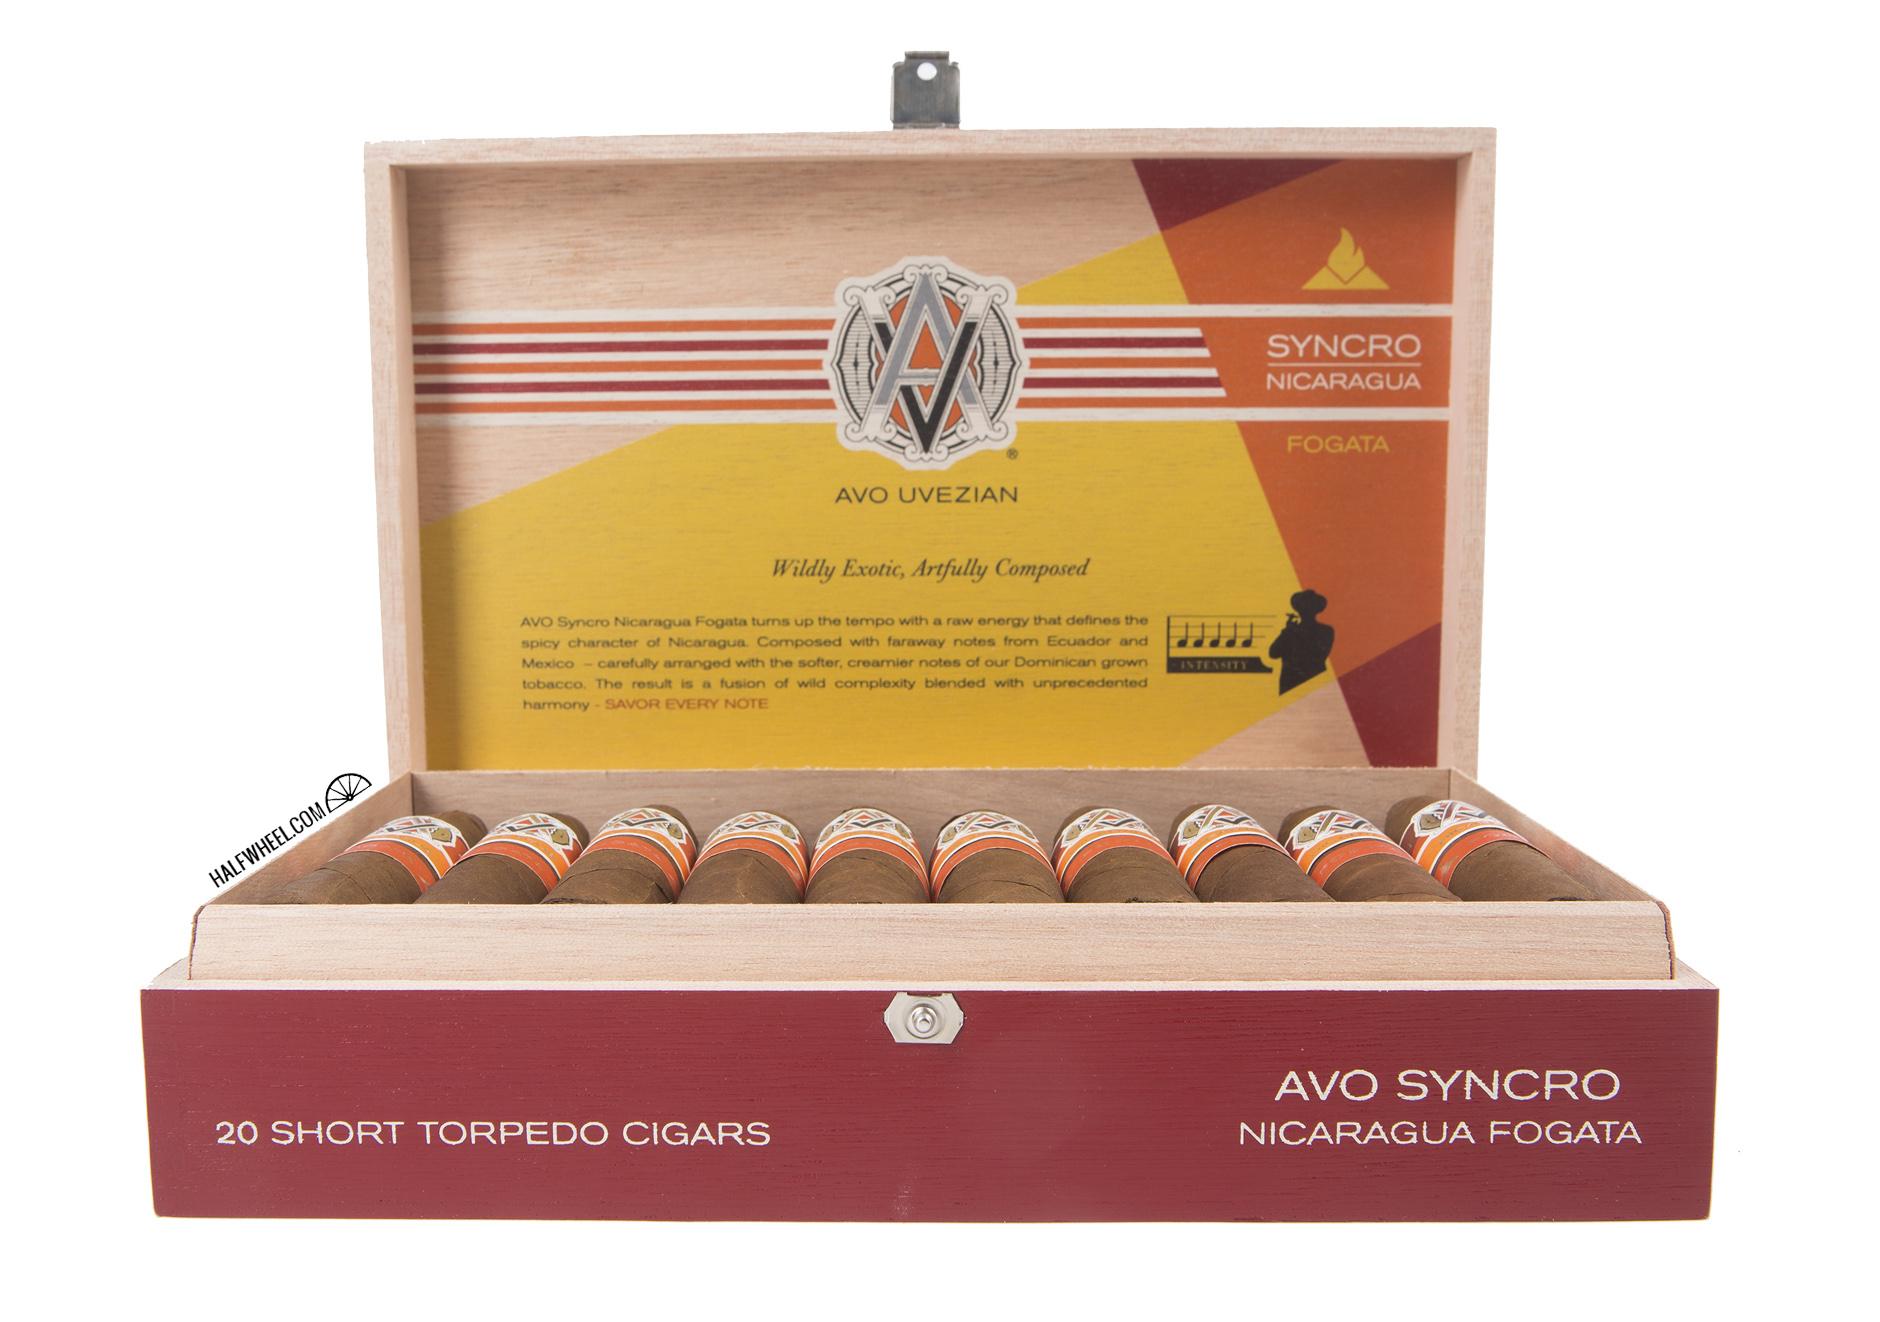 avo-syncro-nicaragua-fogata-short-torpedo-box-2